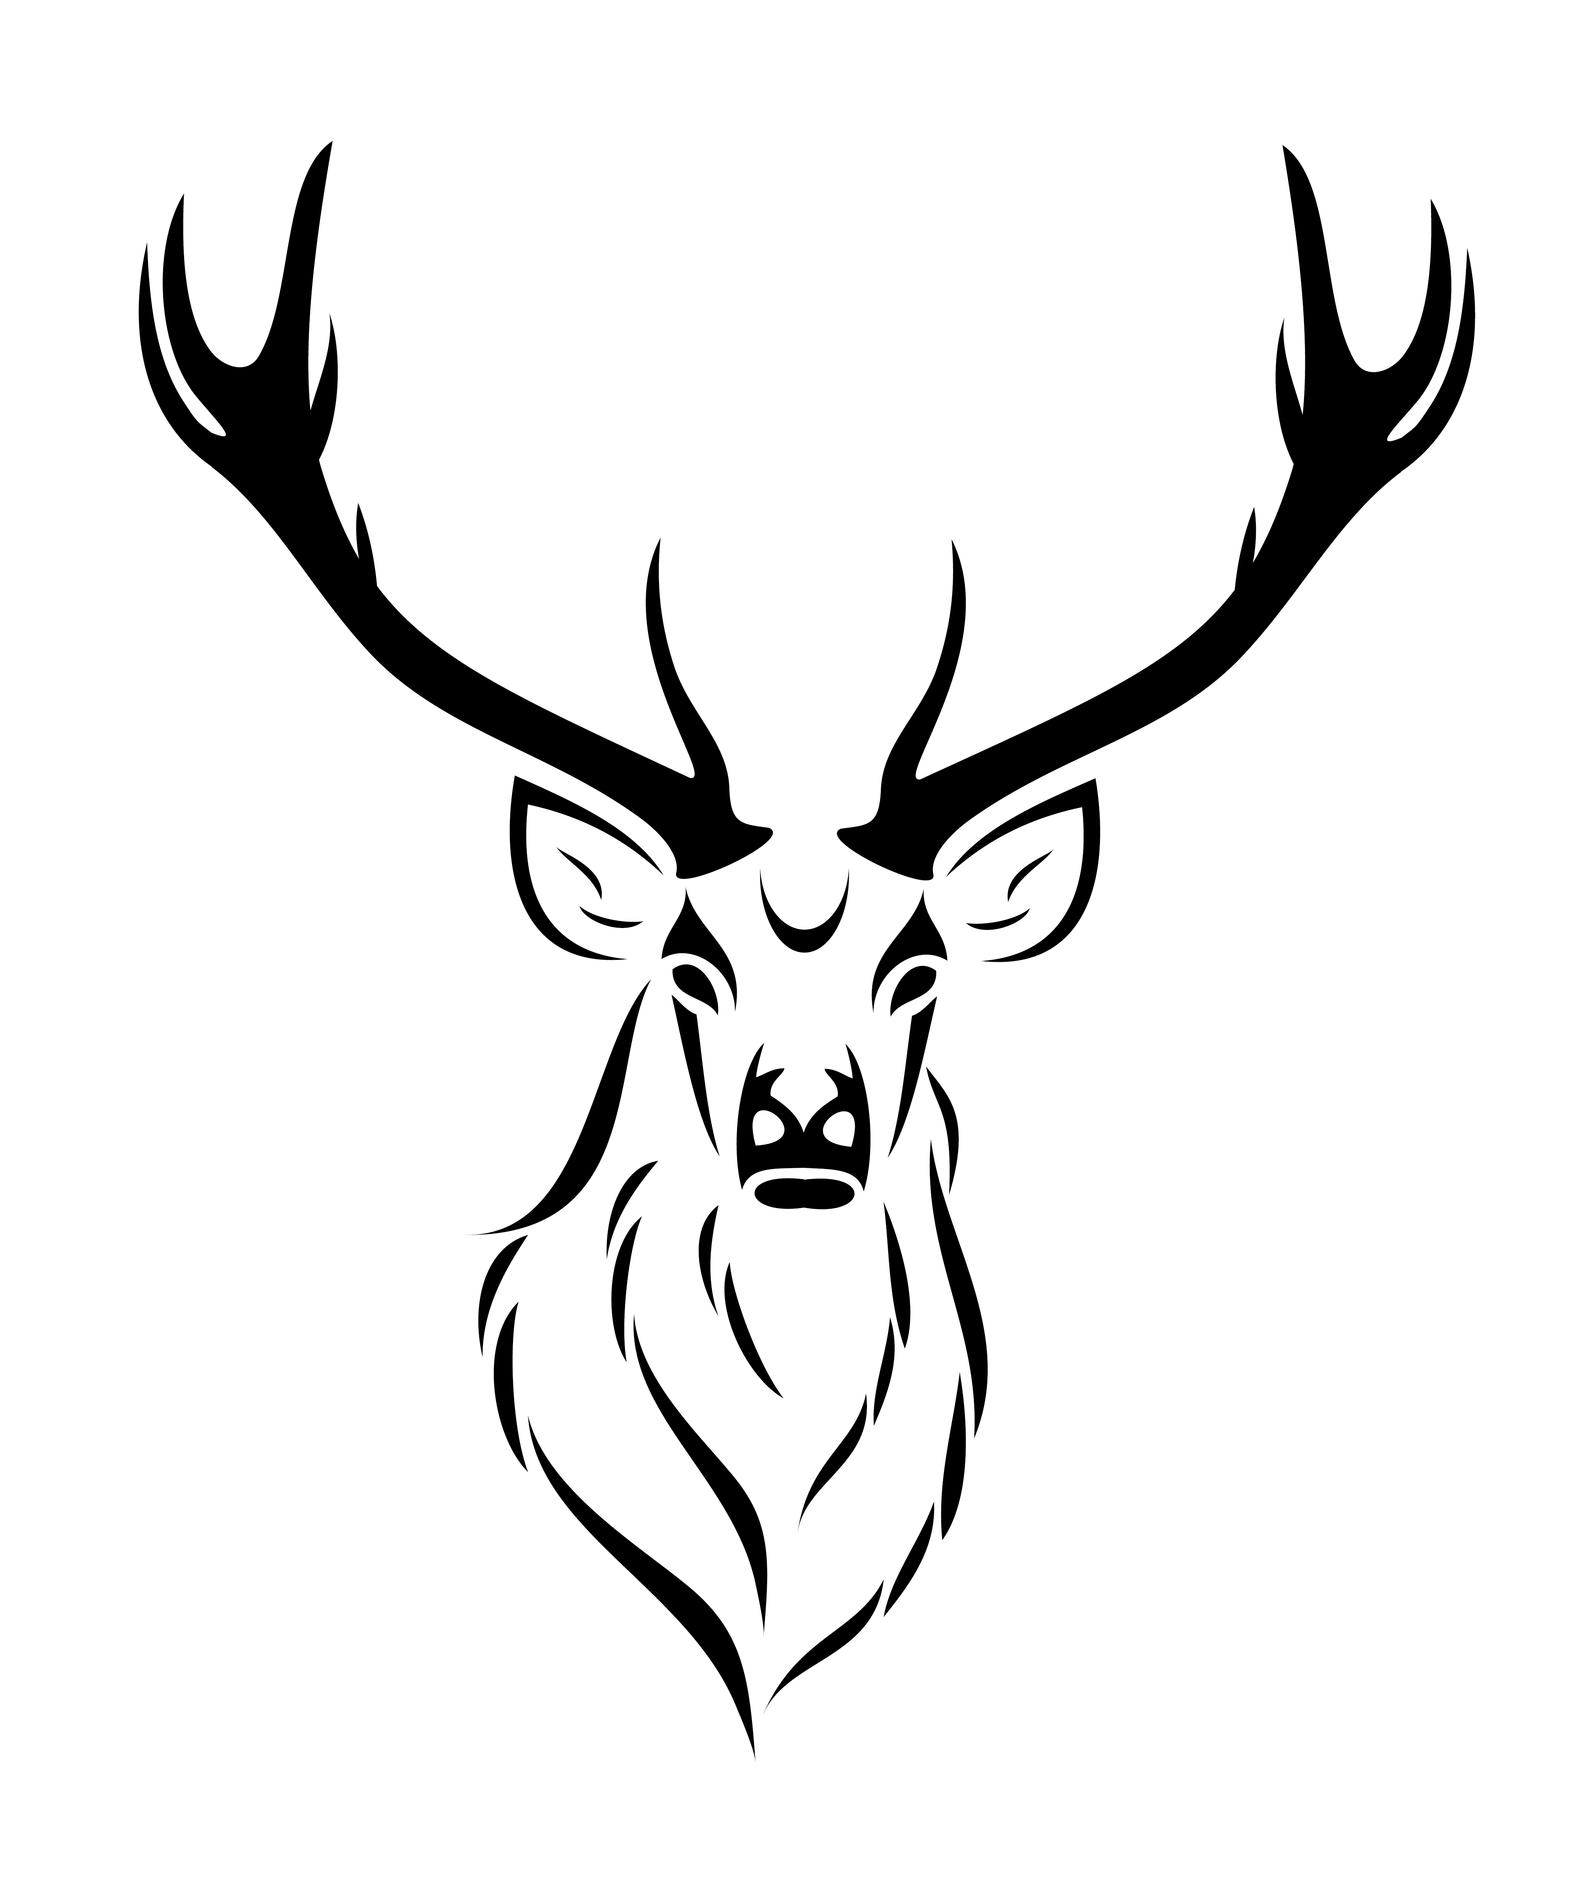 Deer Skull Stencil - ClipArt Best